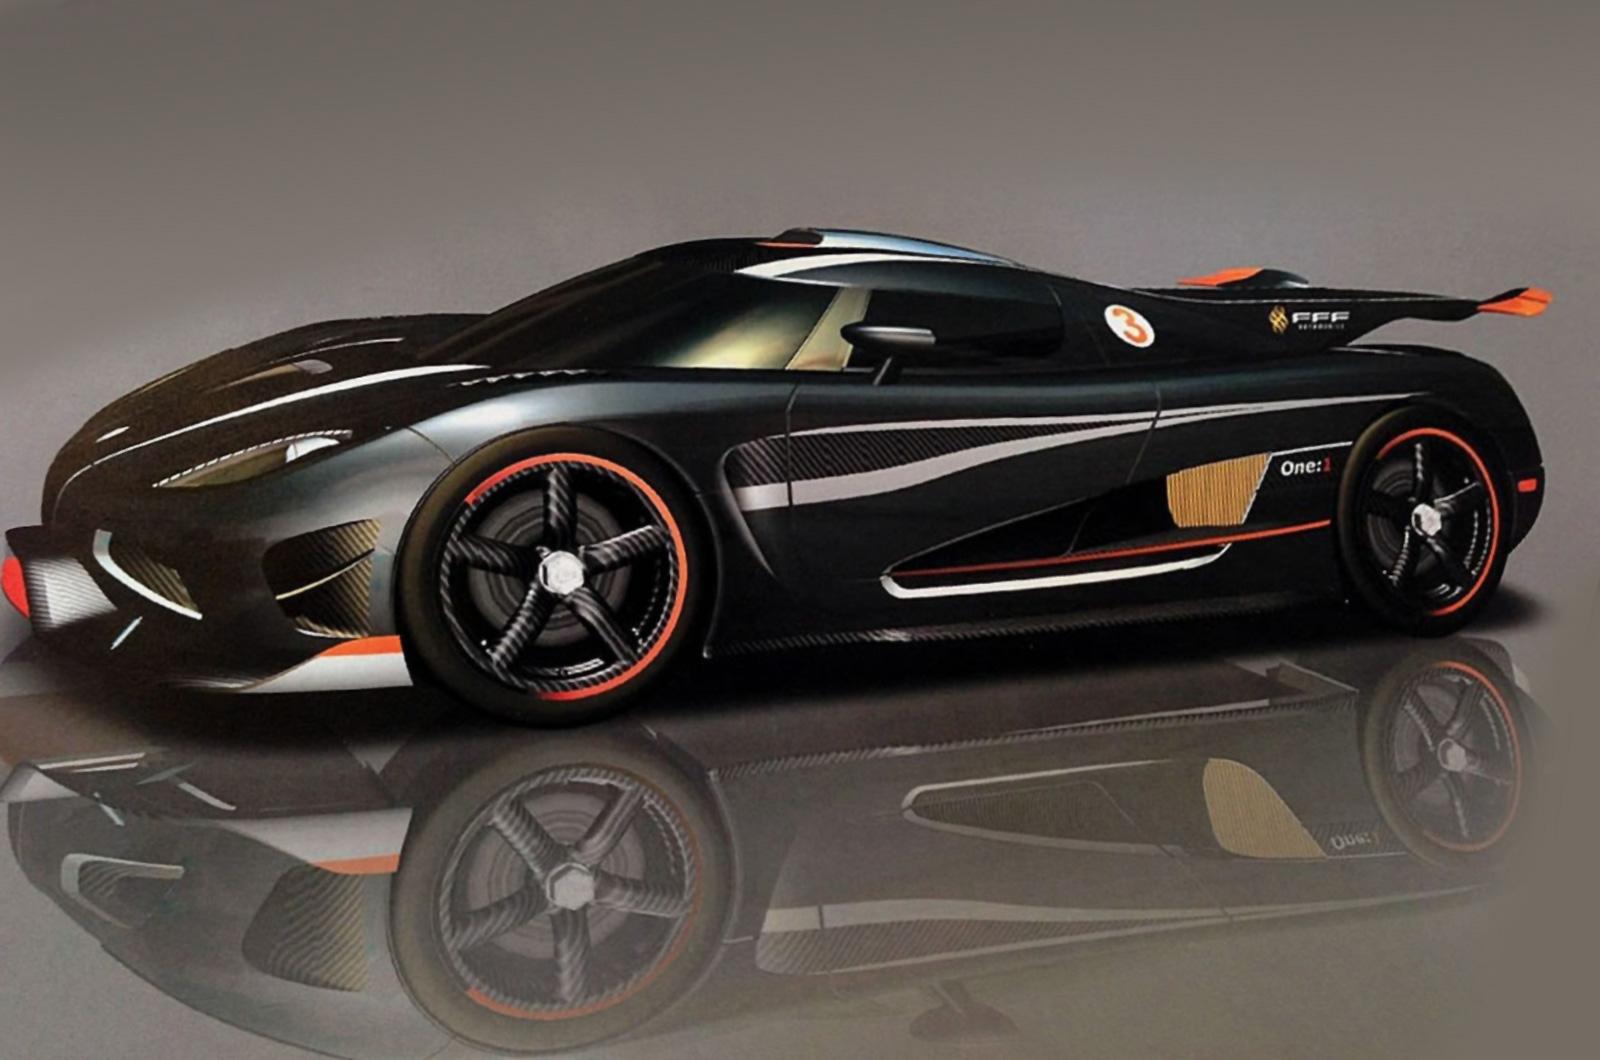 Koenigsegg Agera One 1 Renderings Leaked Autoevolution